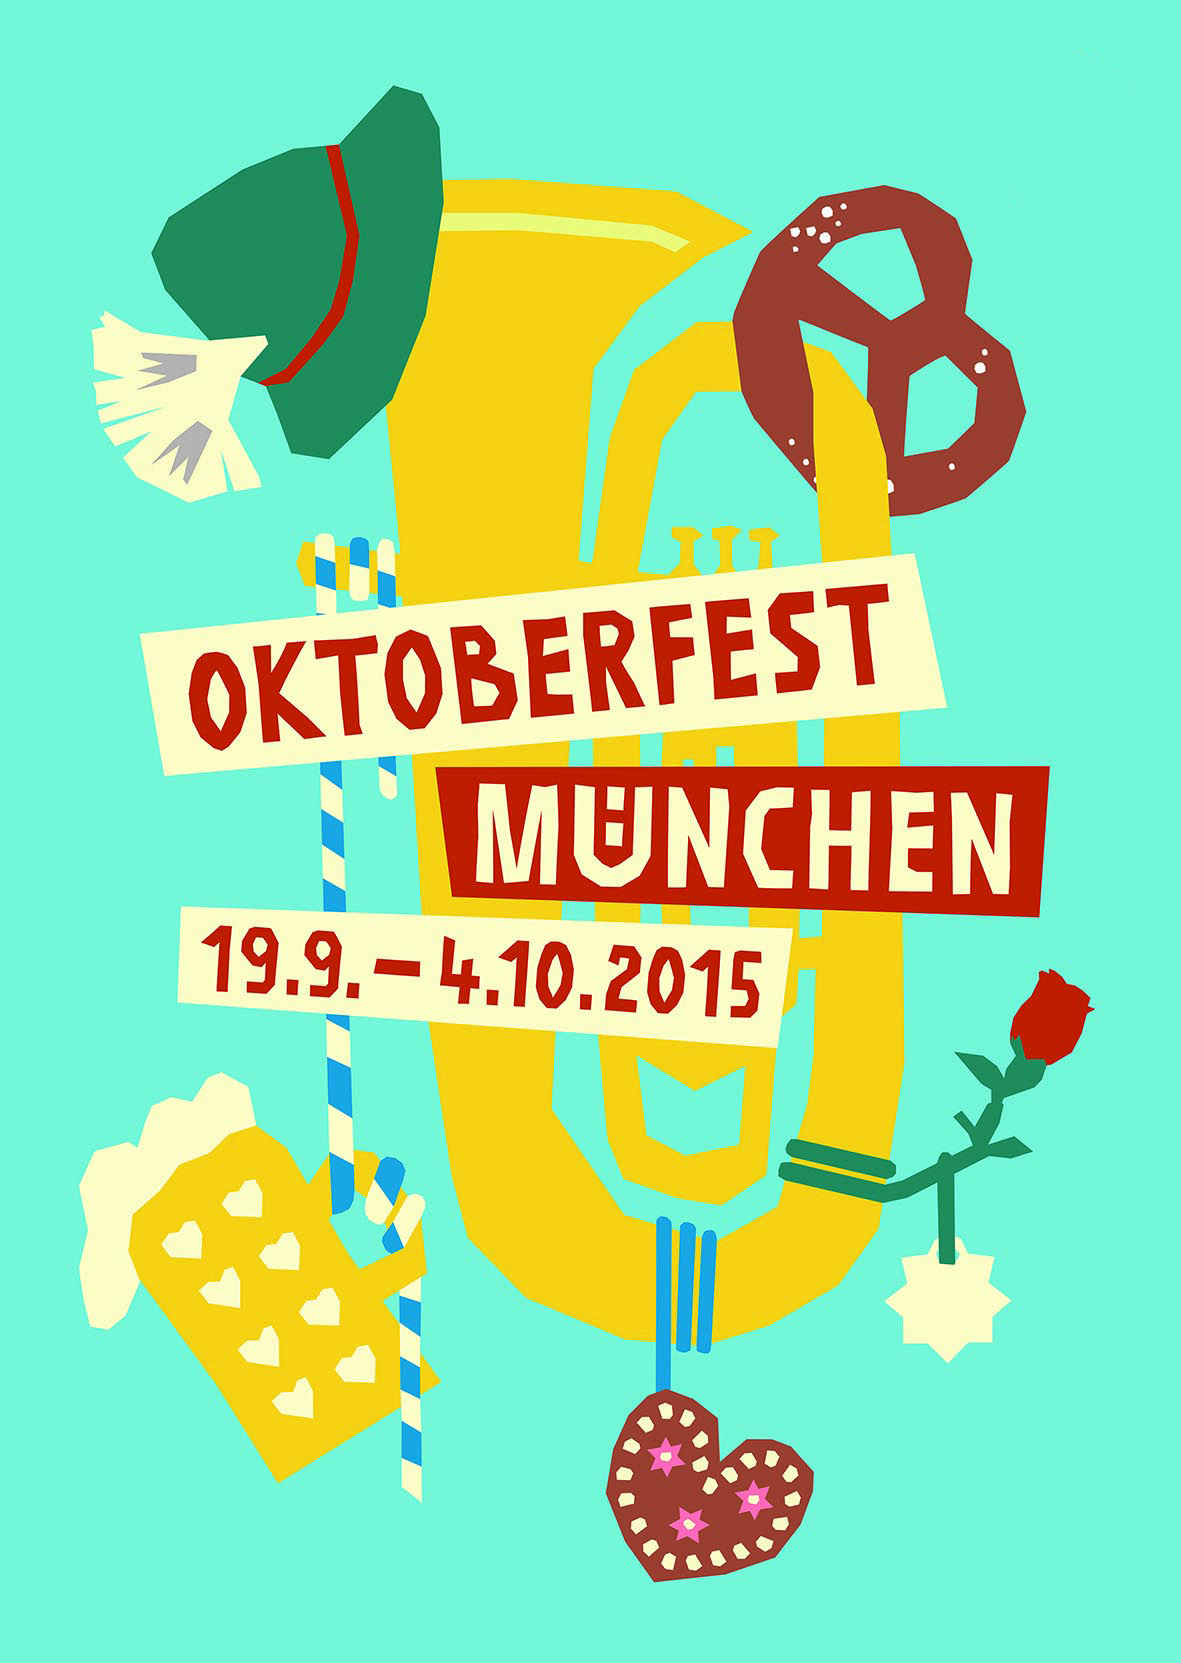 oktoberfest event poster